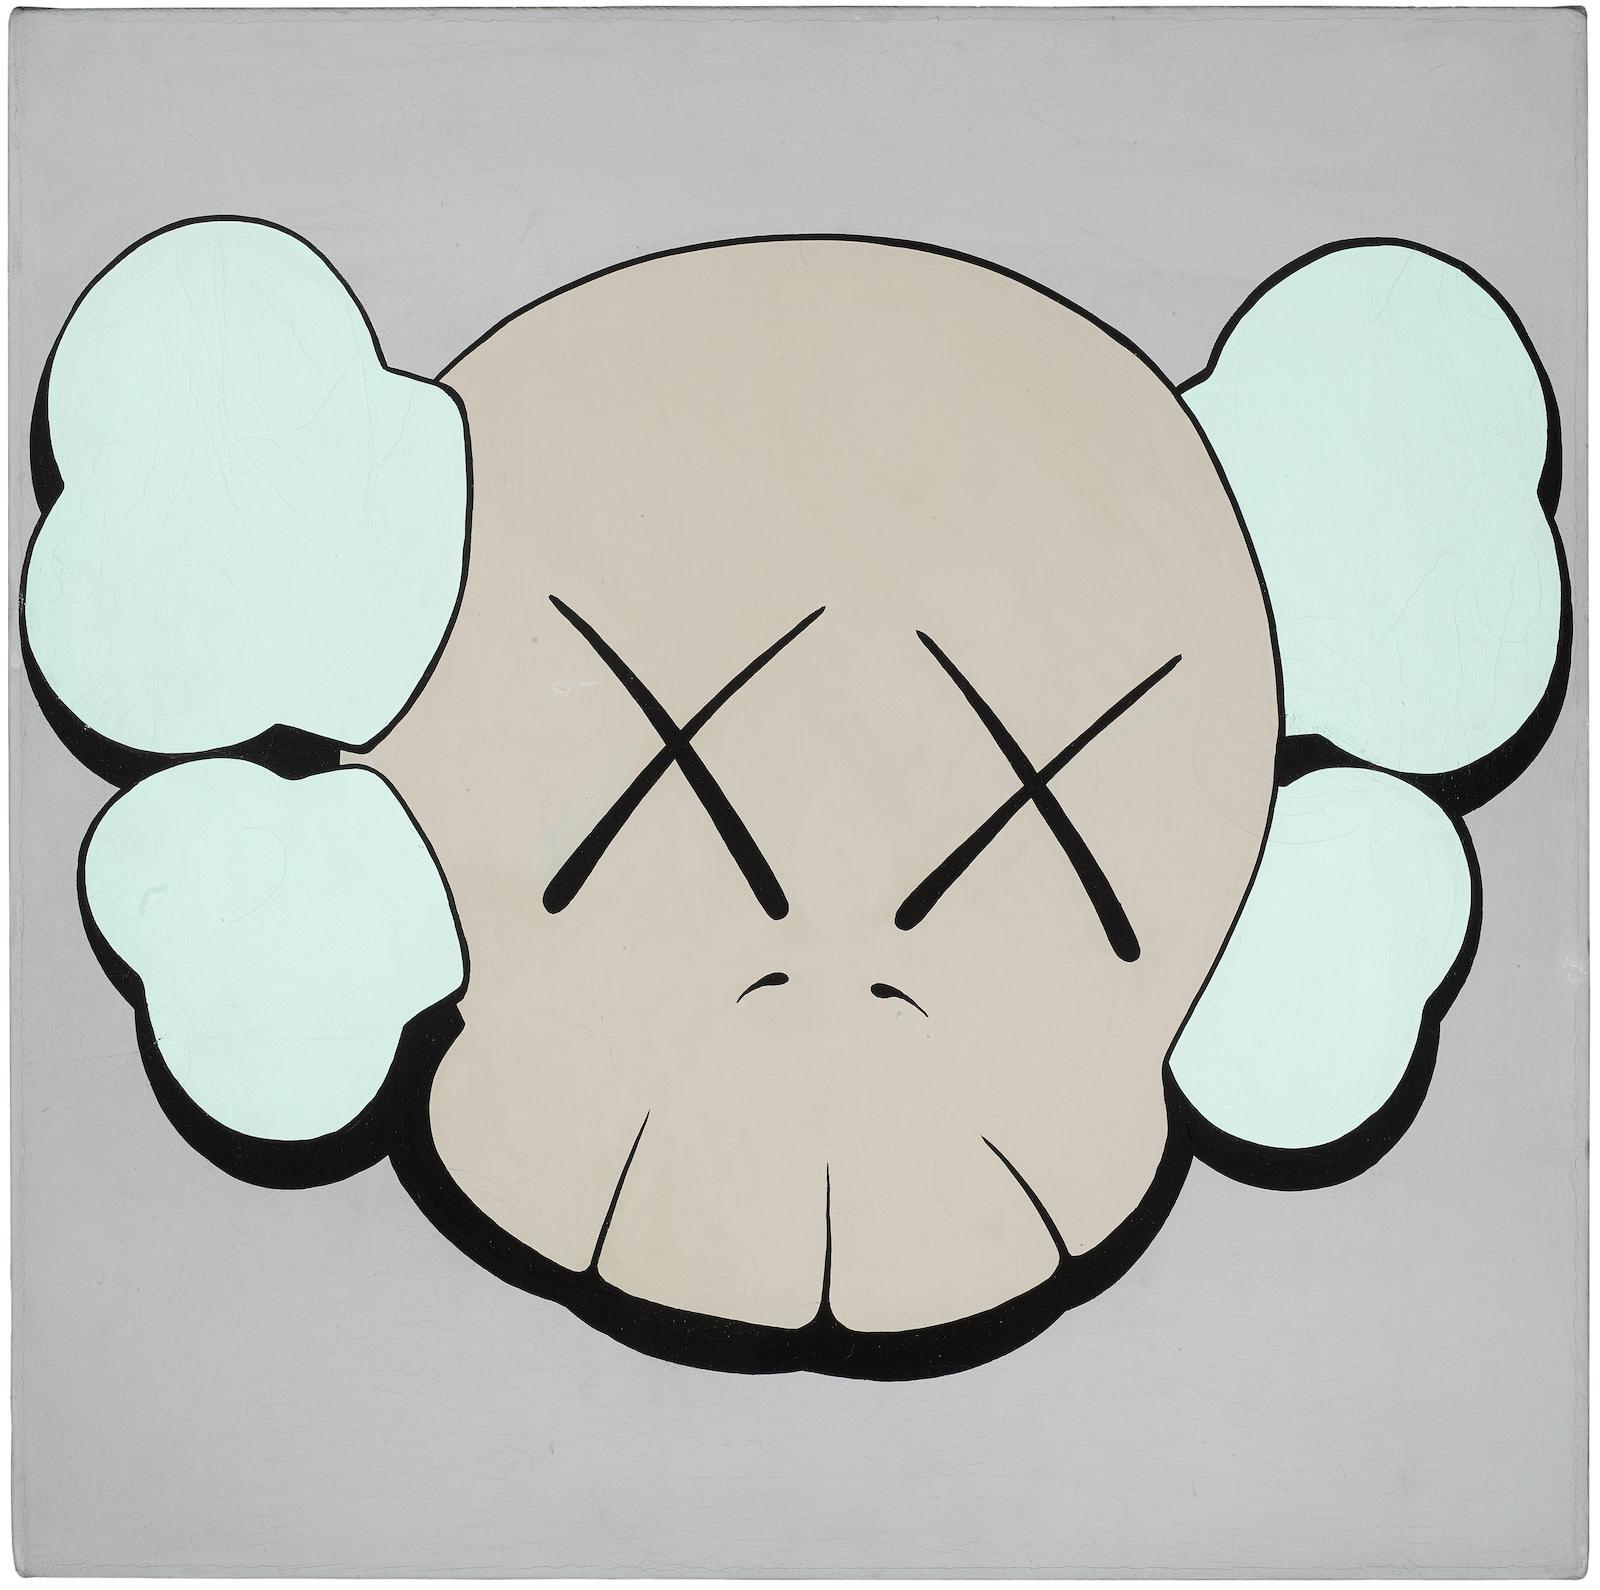 KAWS-Untitled-2000